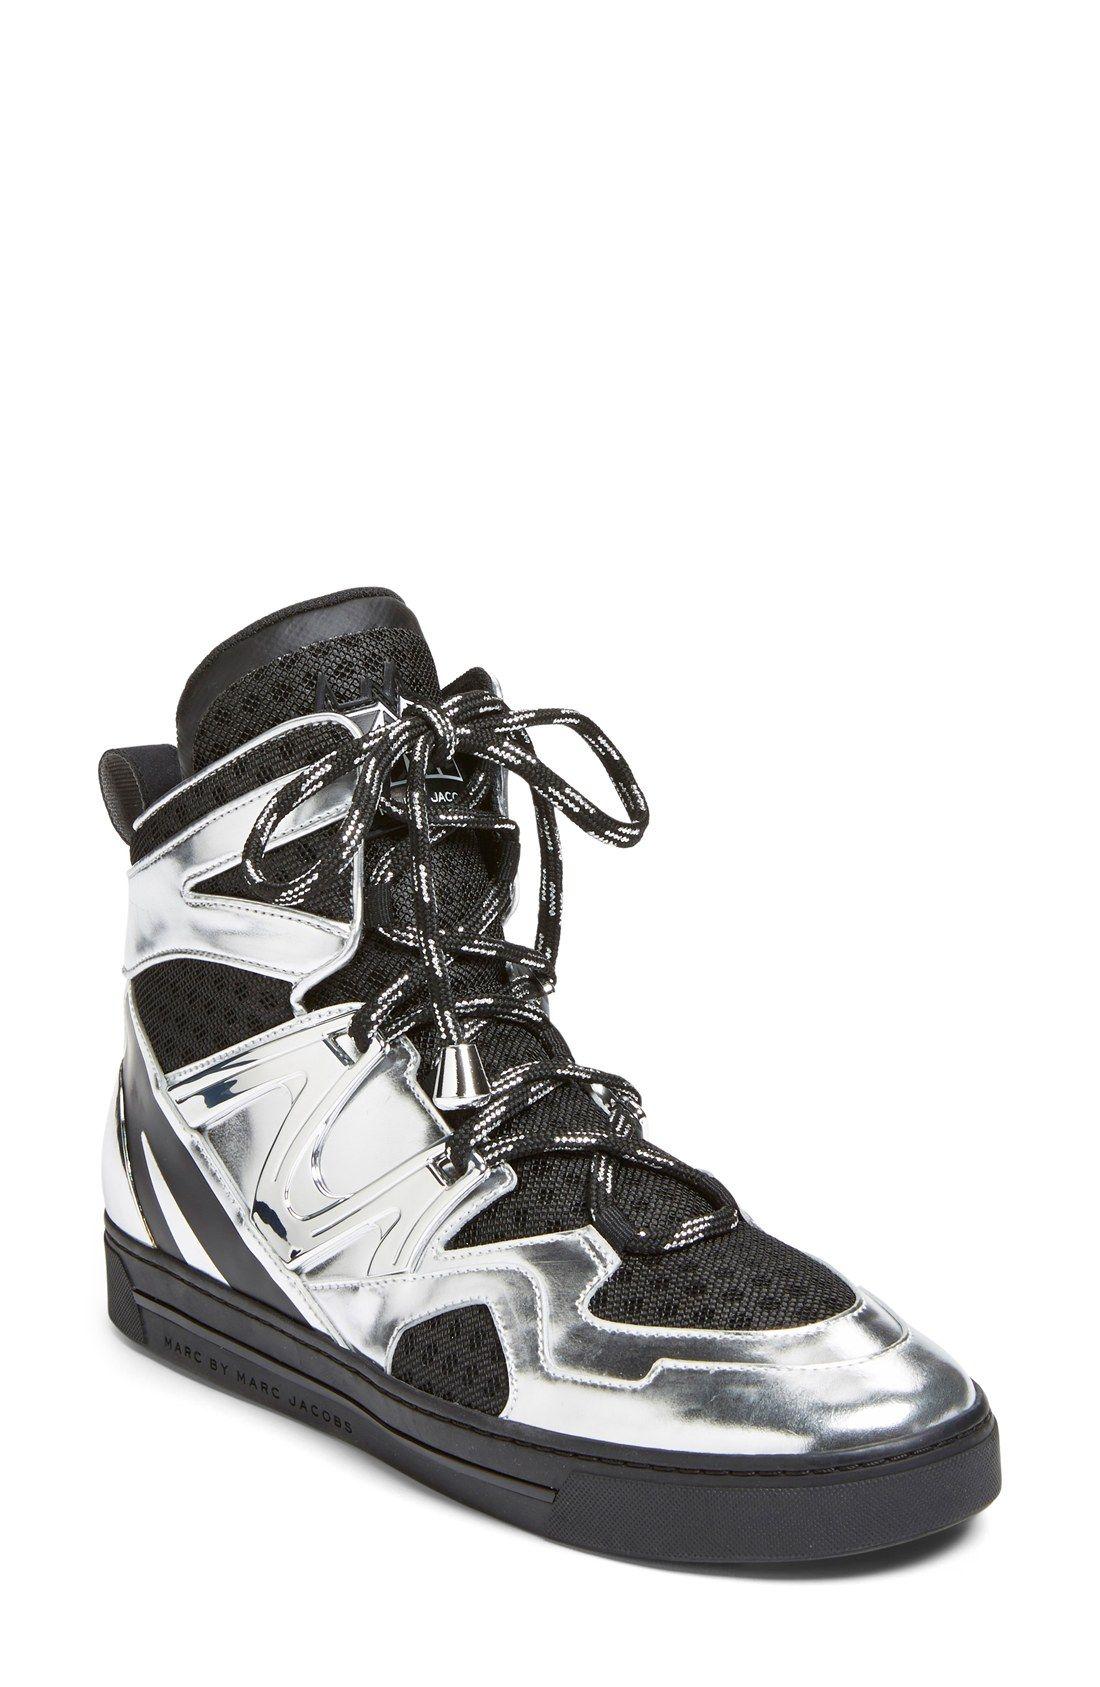 Chaussures - High-tops Et Baskets Marc Jacobs QDsqd